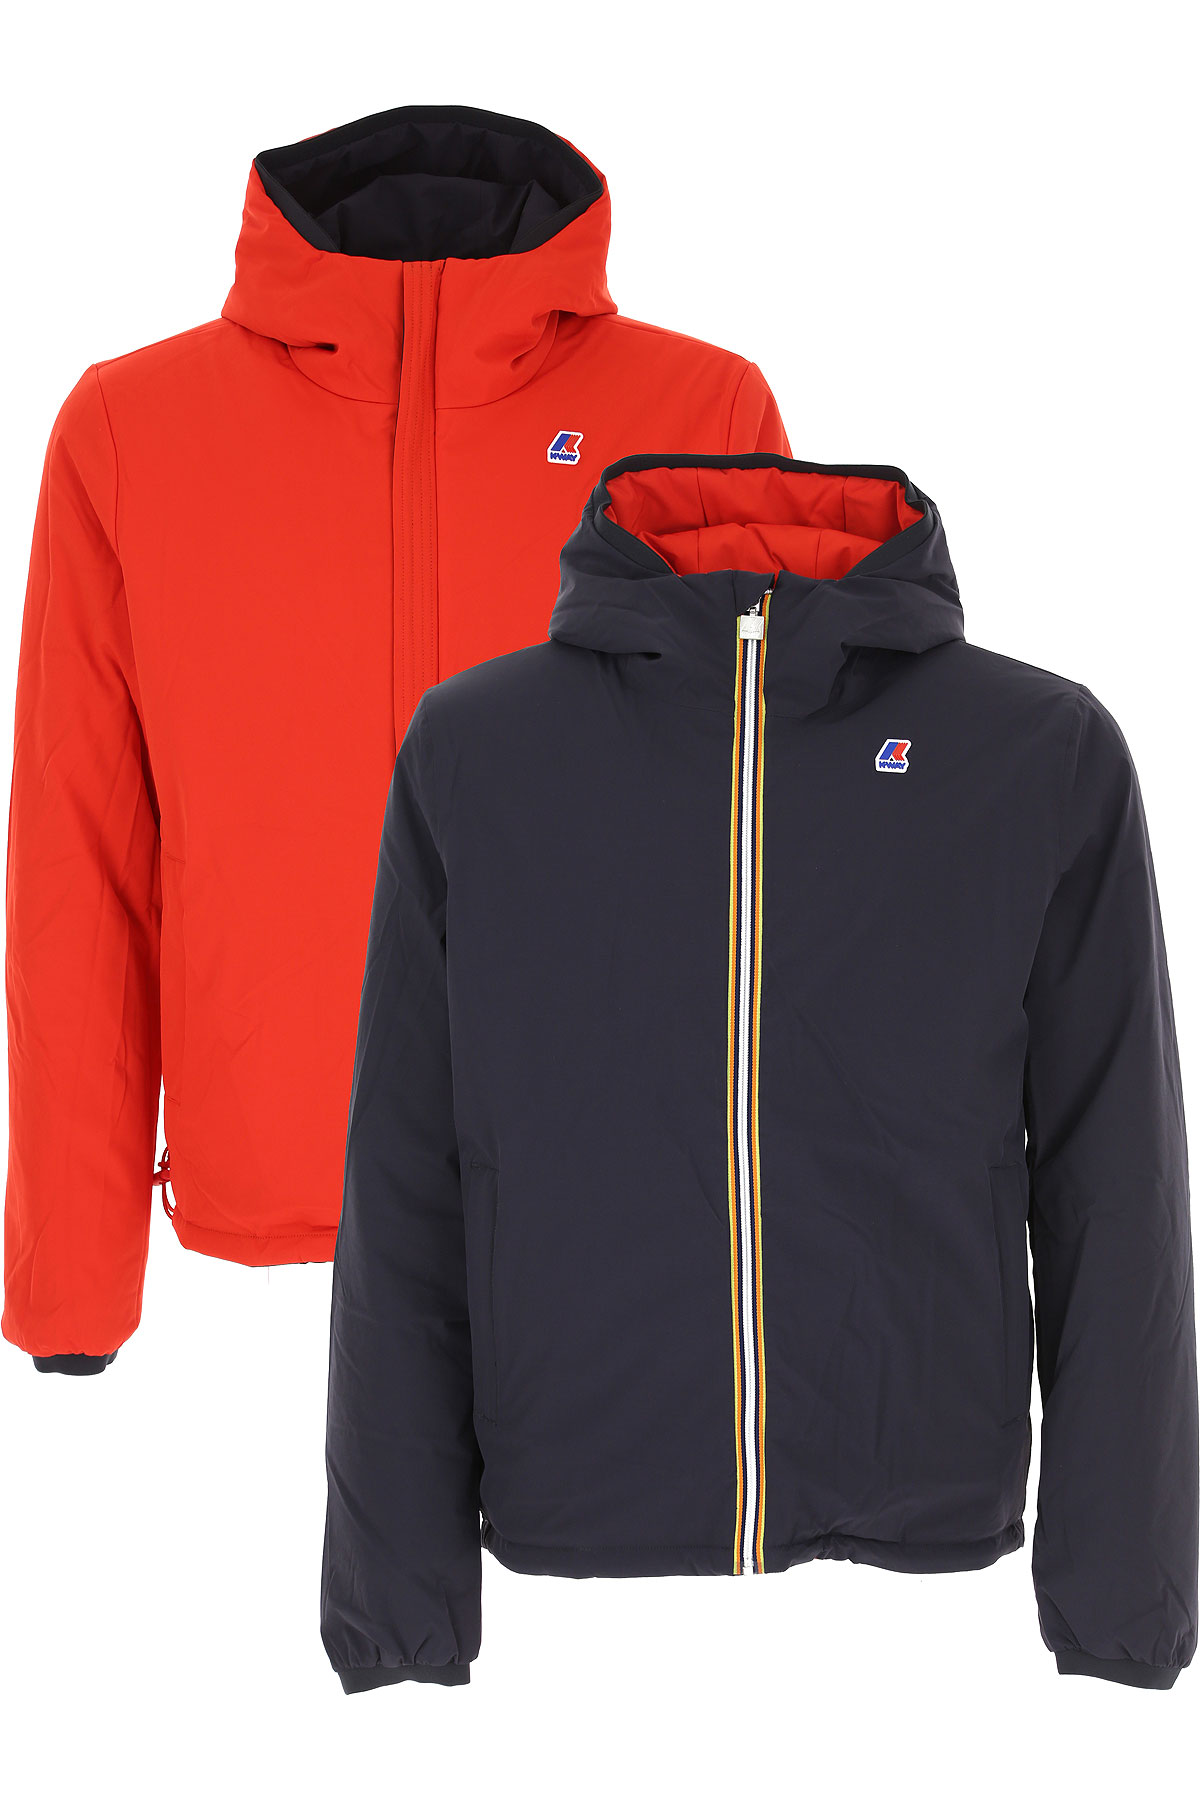 K-Way Down Jacket for Men, Puffer Ski Jacket On Sale, Ink Blue, polyamide, 2019, L M S XL XXL